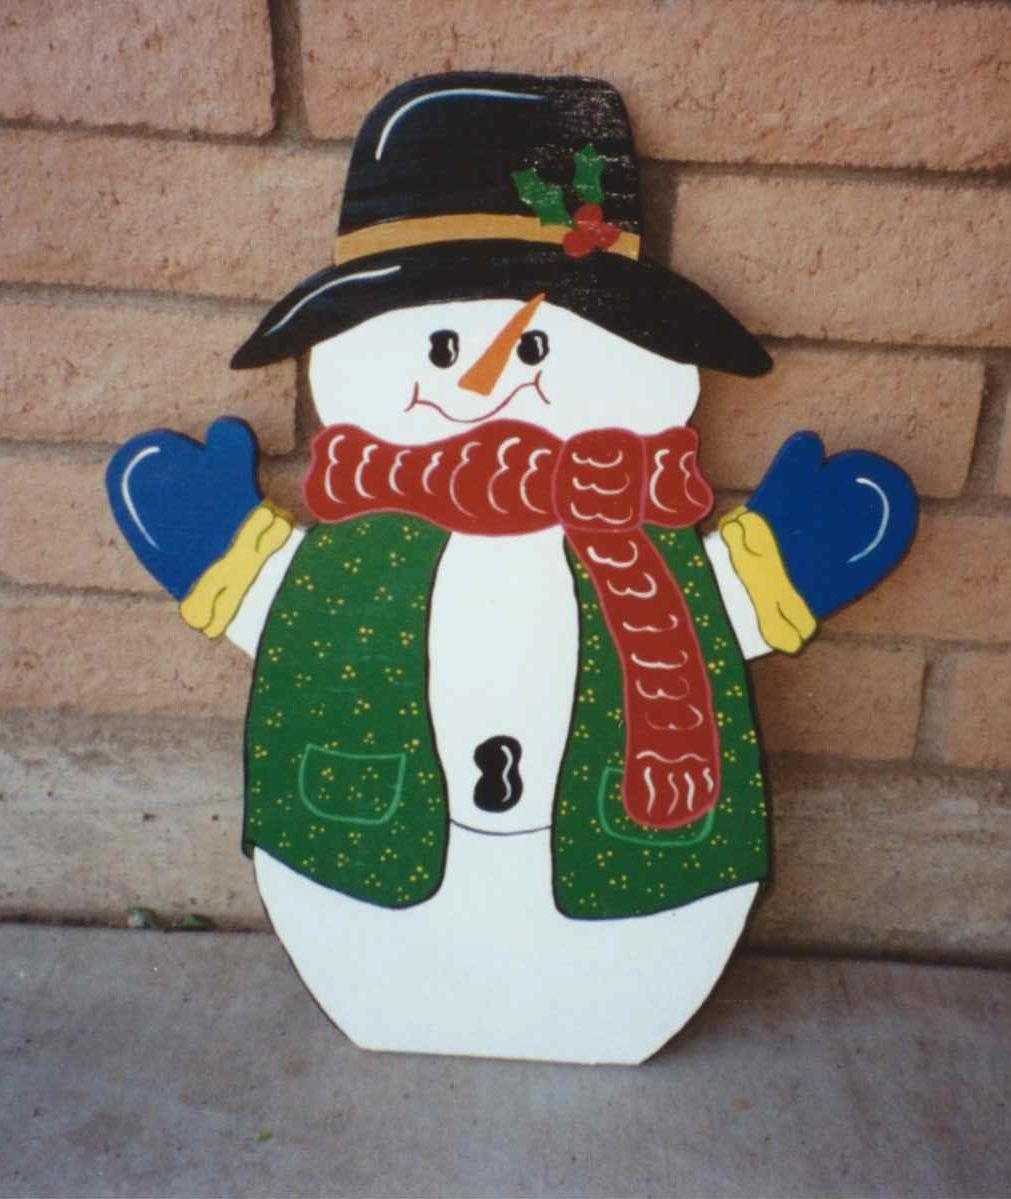 Diy Plywood Christmas Yard Decorations